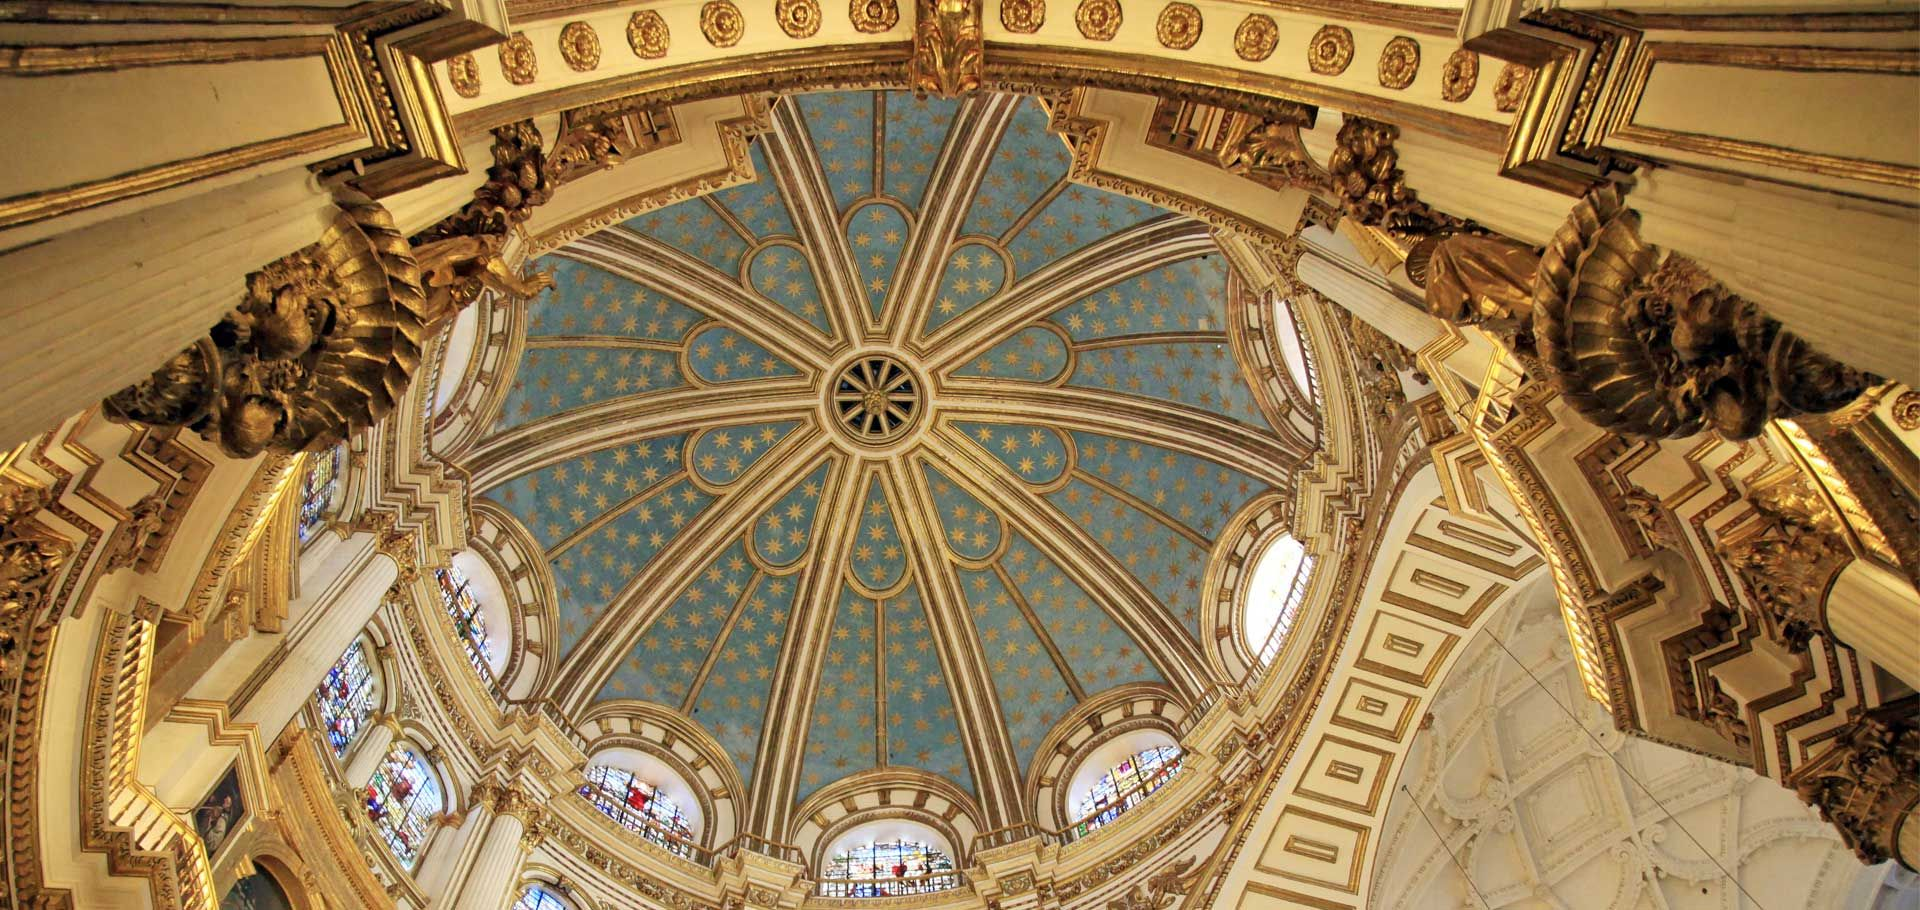 Catedral de Granada - Página Principal - Santa Iglesia Catedral Metropolitana de…